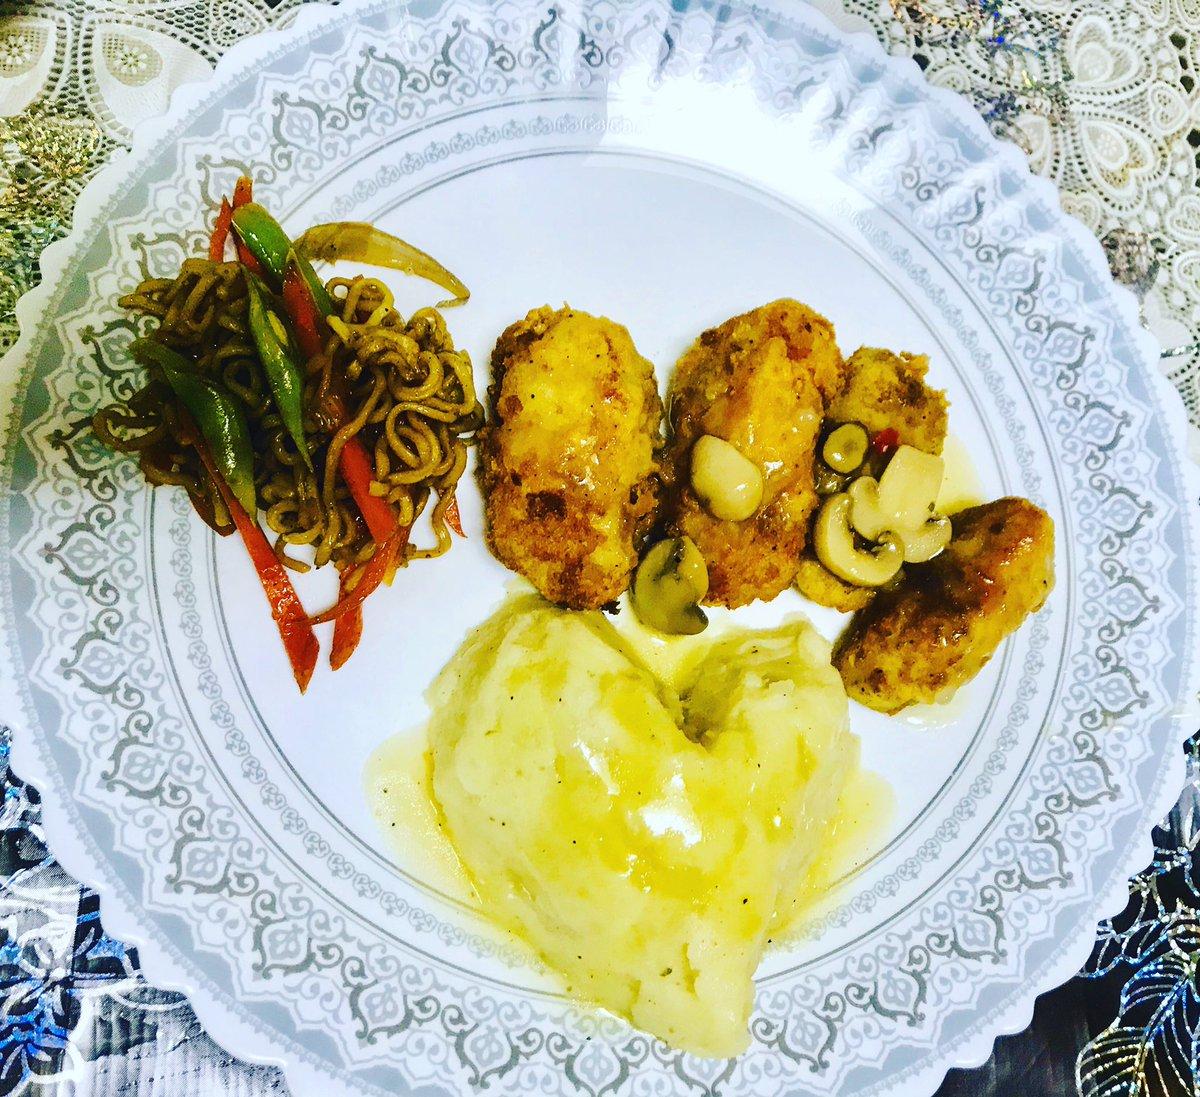 Mi Casa de Bedats 😂 mangaon! 🥘   #homecooking  #foodie  #foodlife  #foodporn https://t.co/aerZPKY3K0